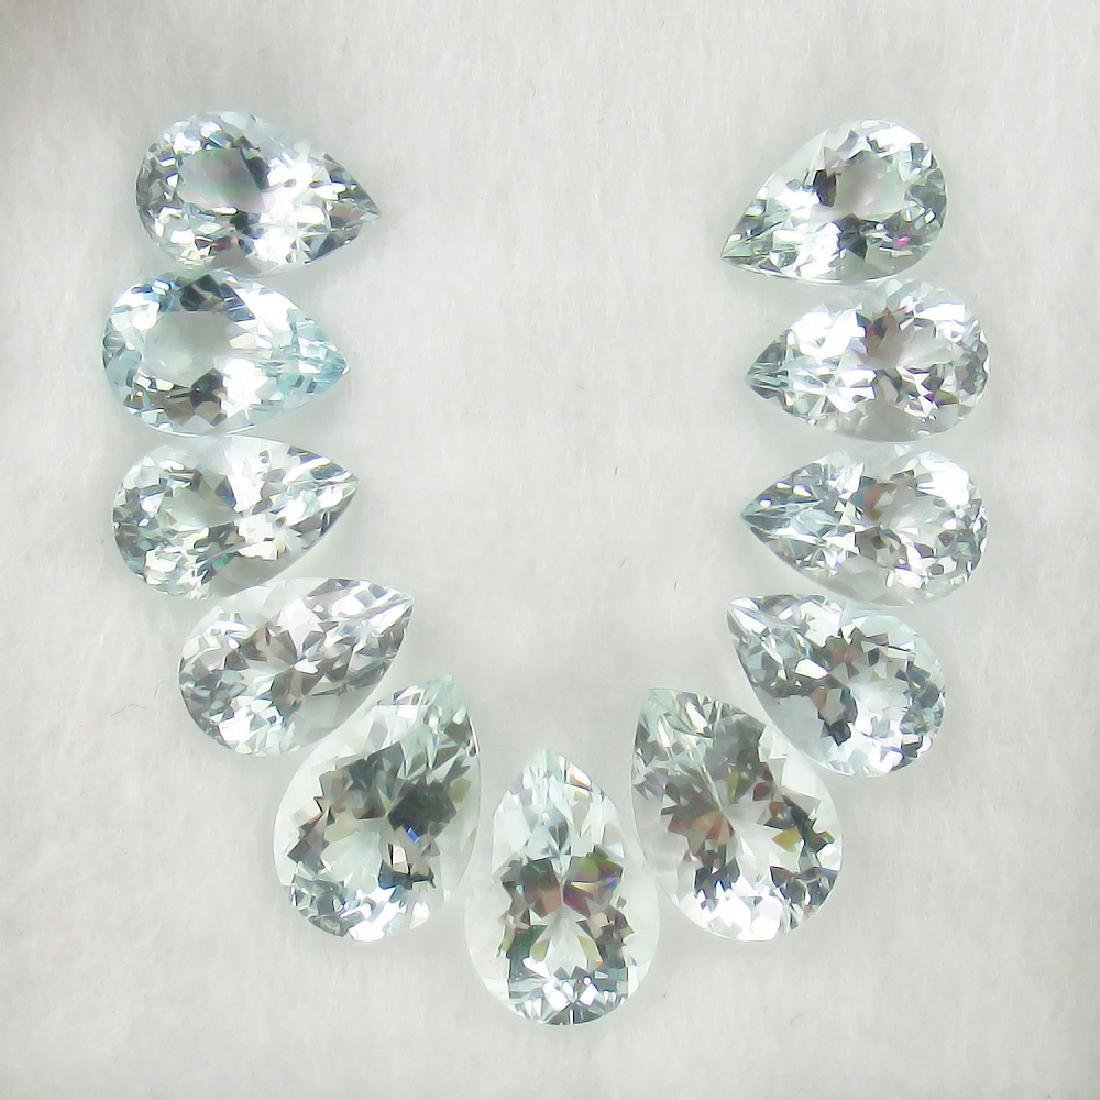 14.37 Ct Genuine Matching Pear cut Aquamarine Necklace